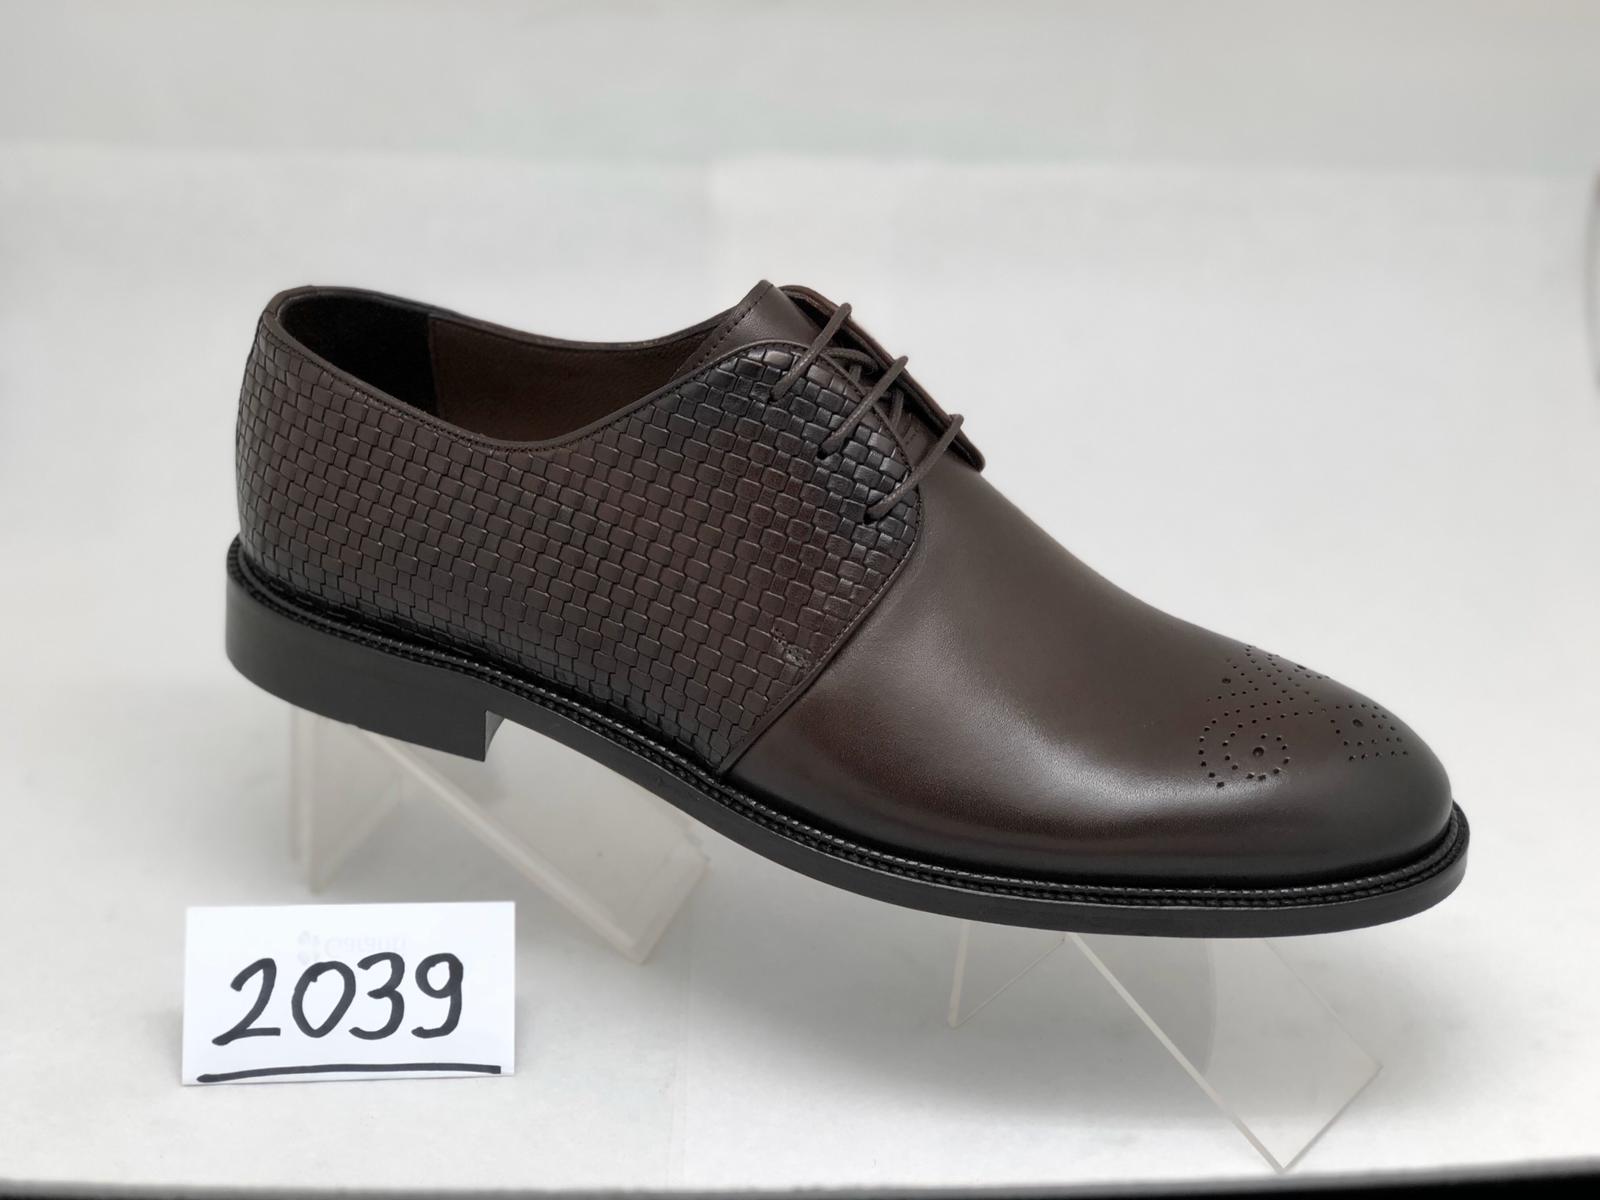 2039 Microlight Taban Ayakkabı